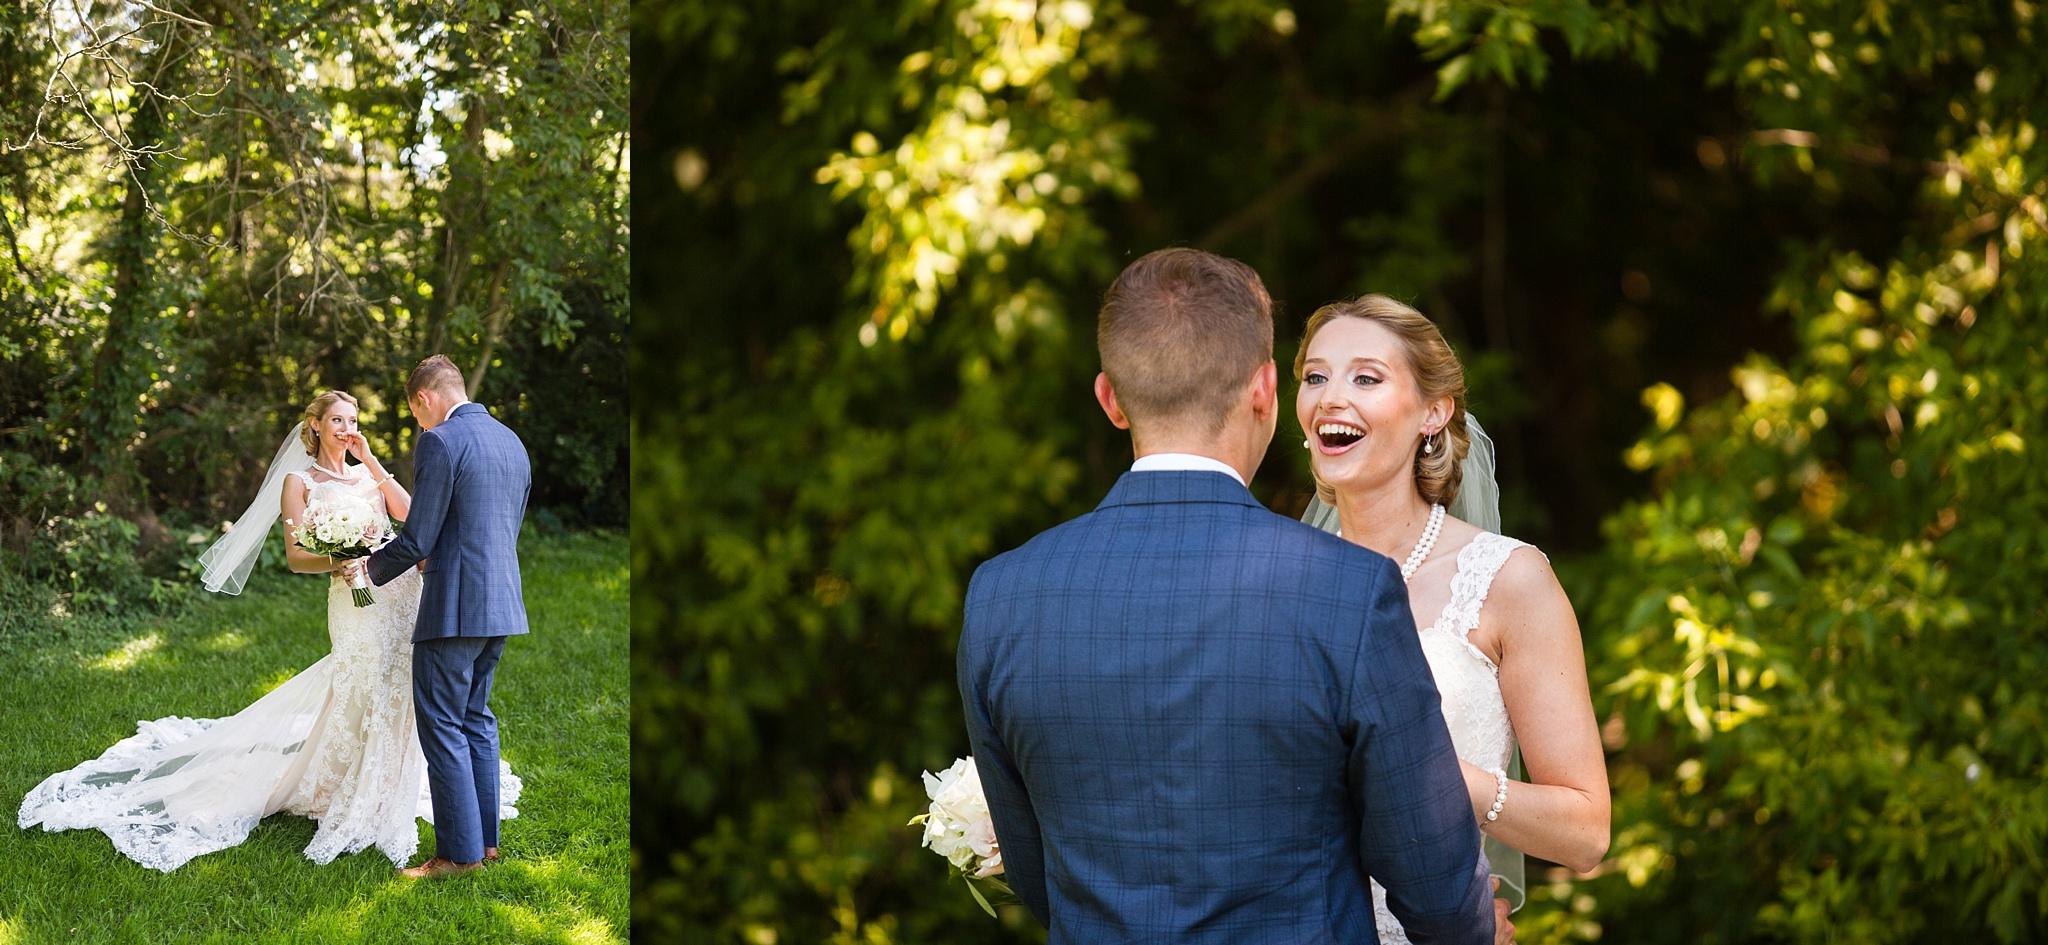 Becky_Cameron_Grand_Rapids_Blythefield Country_Club_Wedding022.JPG